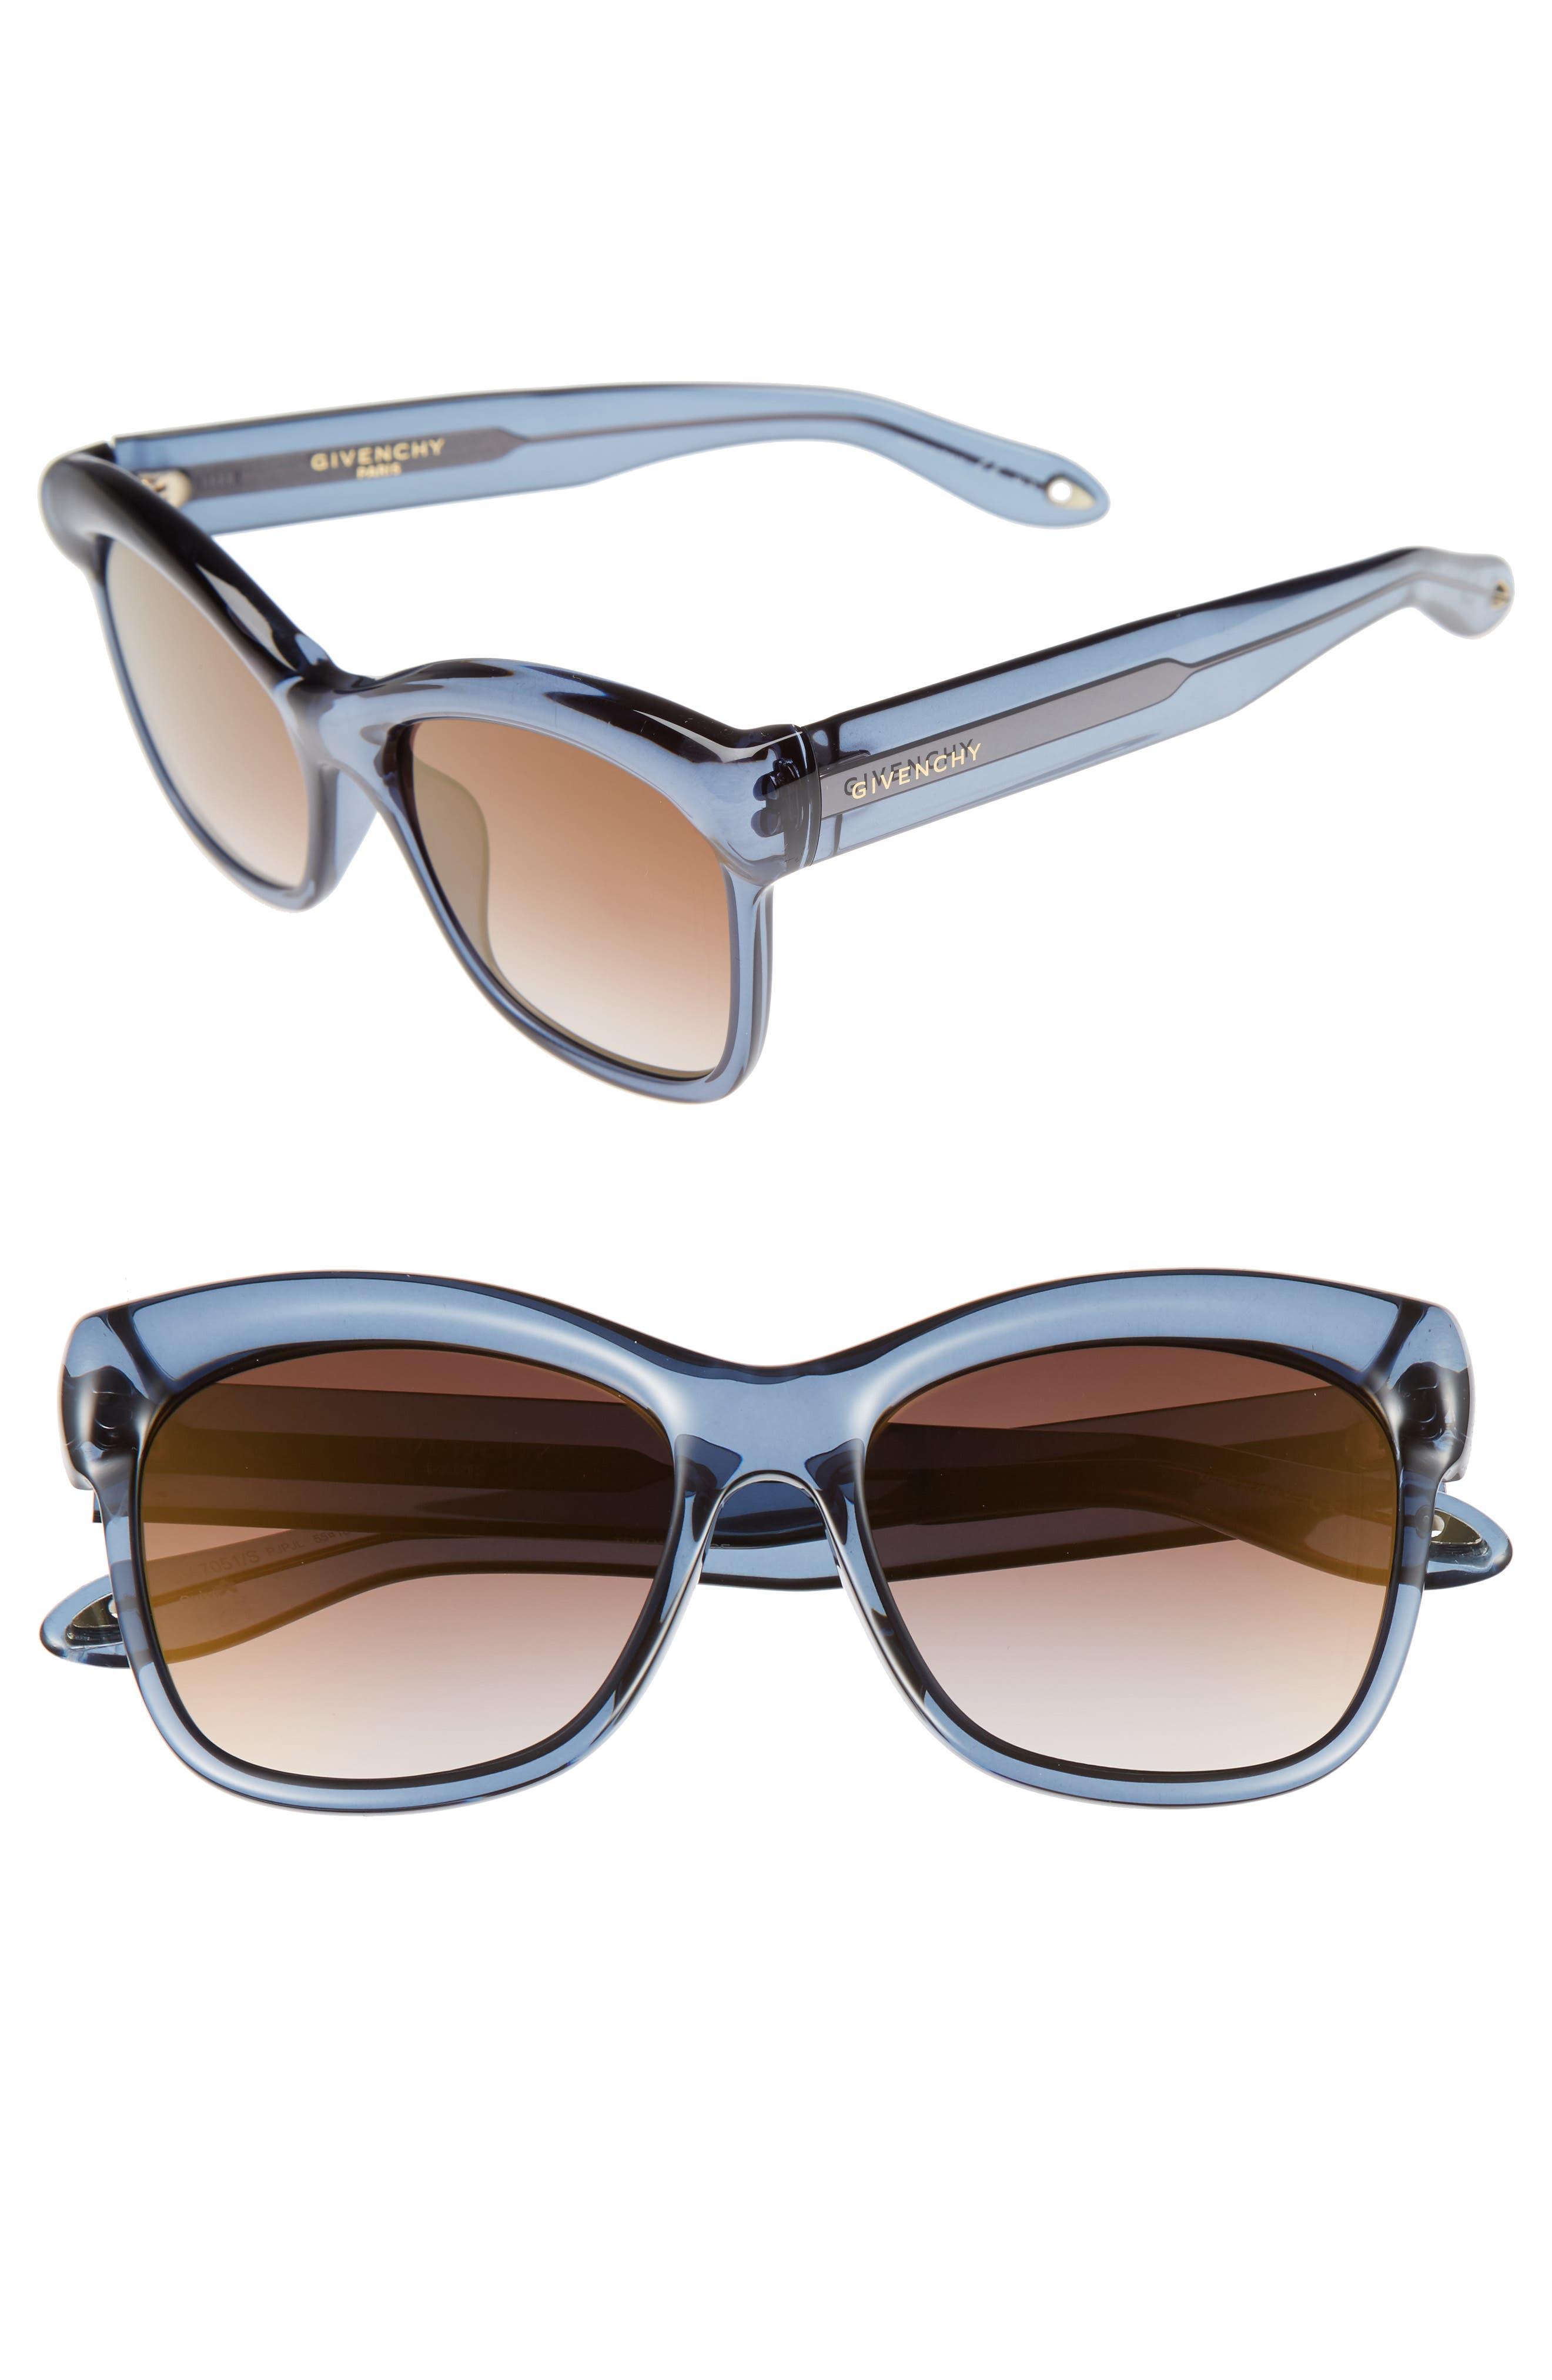 55mm Retro Sunglasses,                             Main thumbnail 1, color,                             Blue